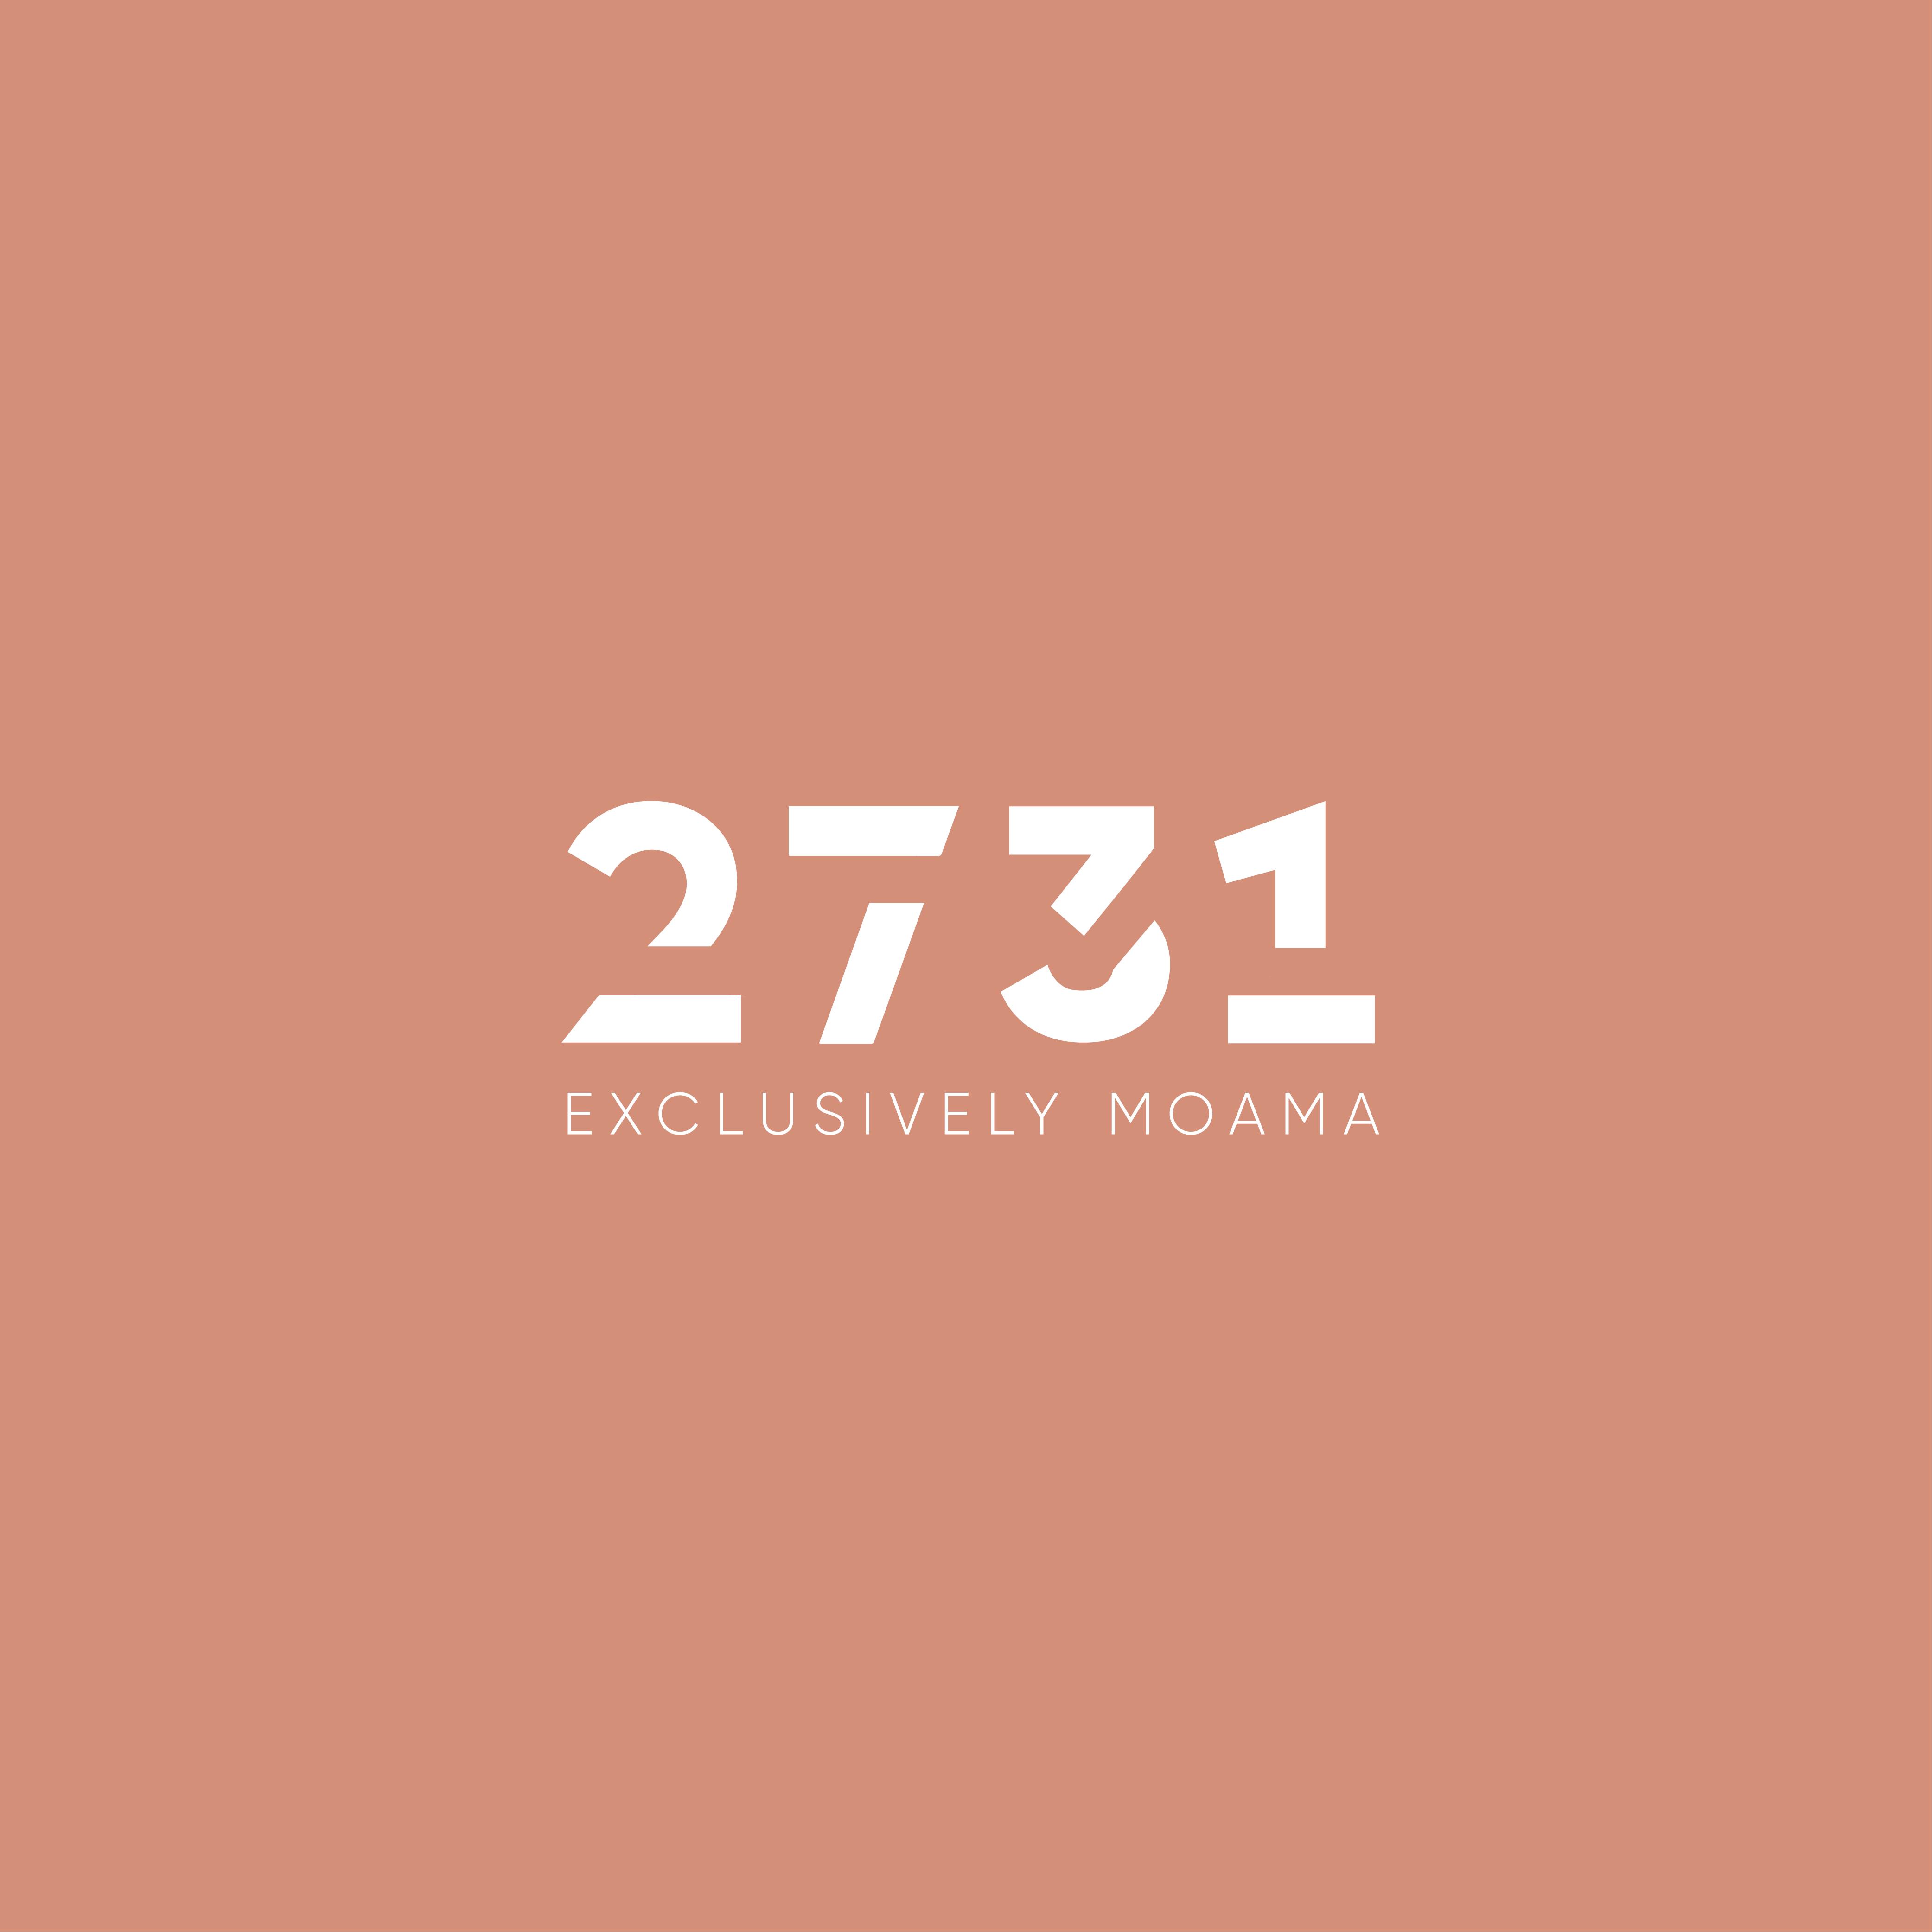 2731 C